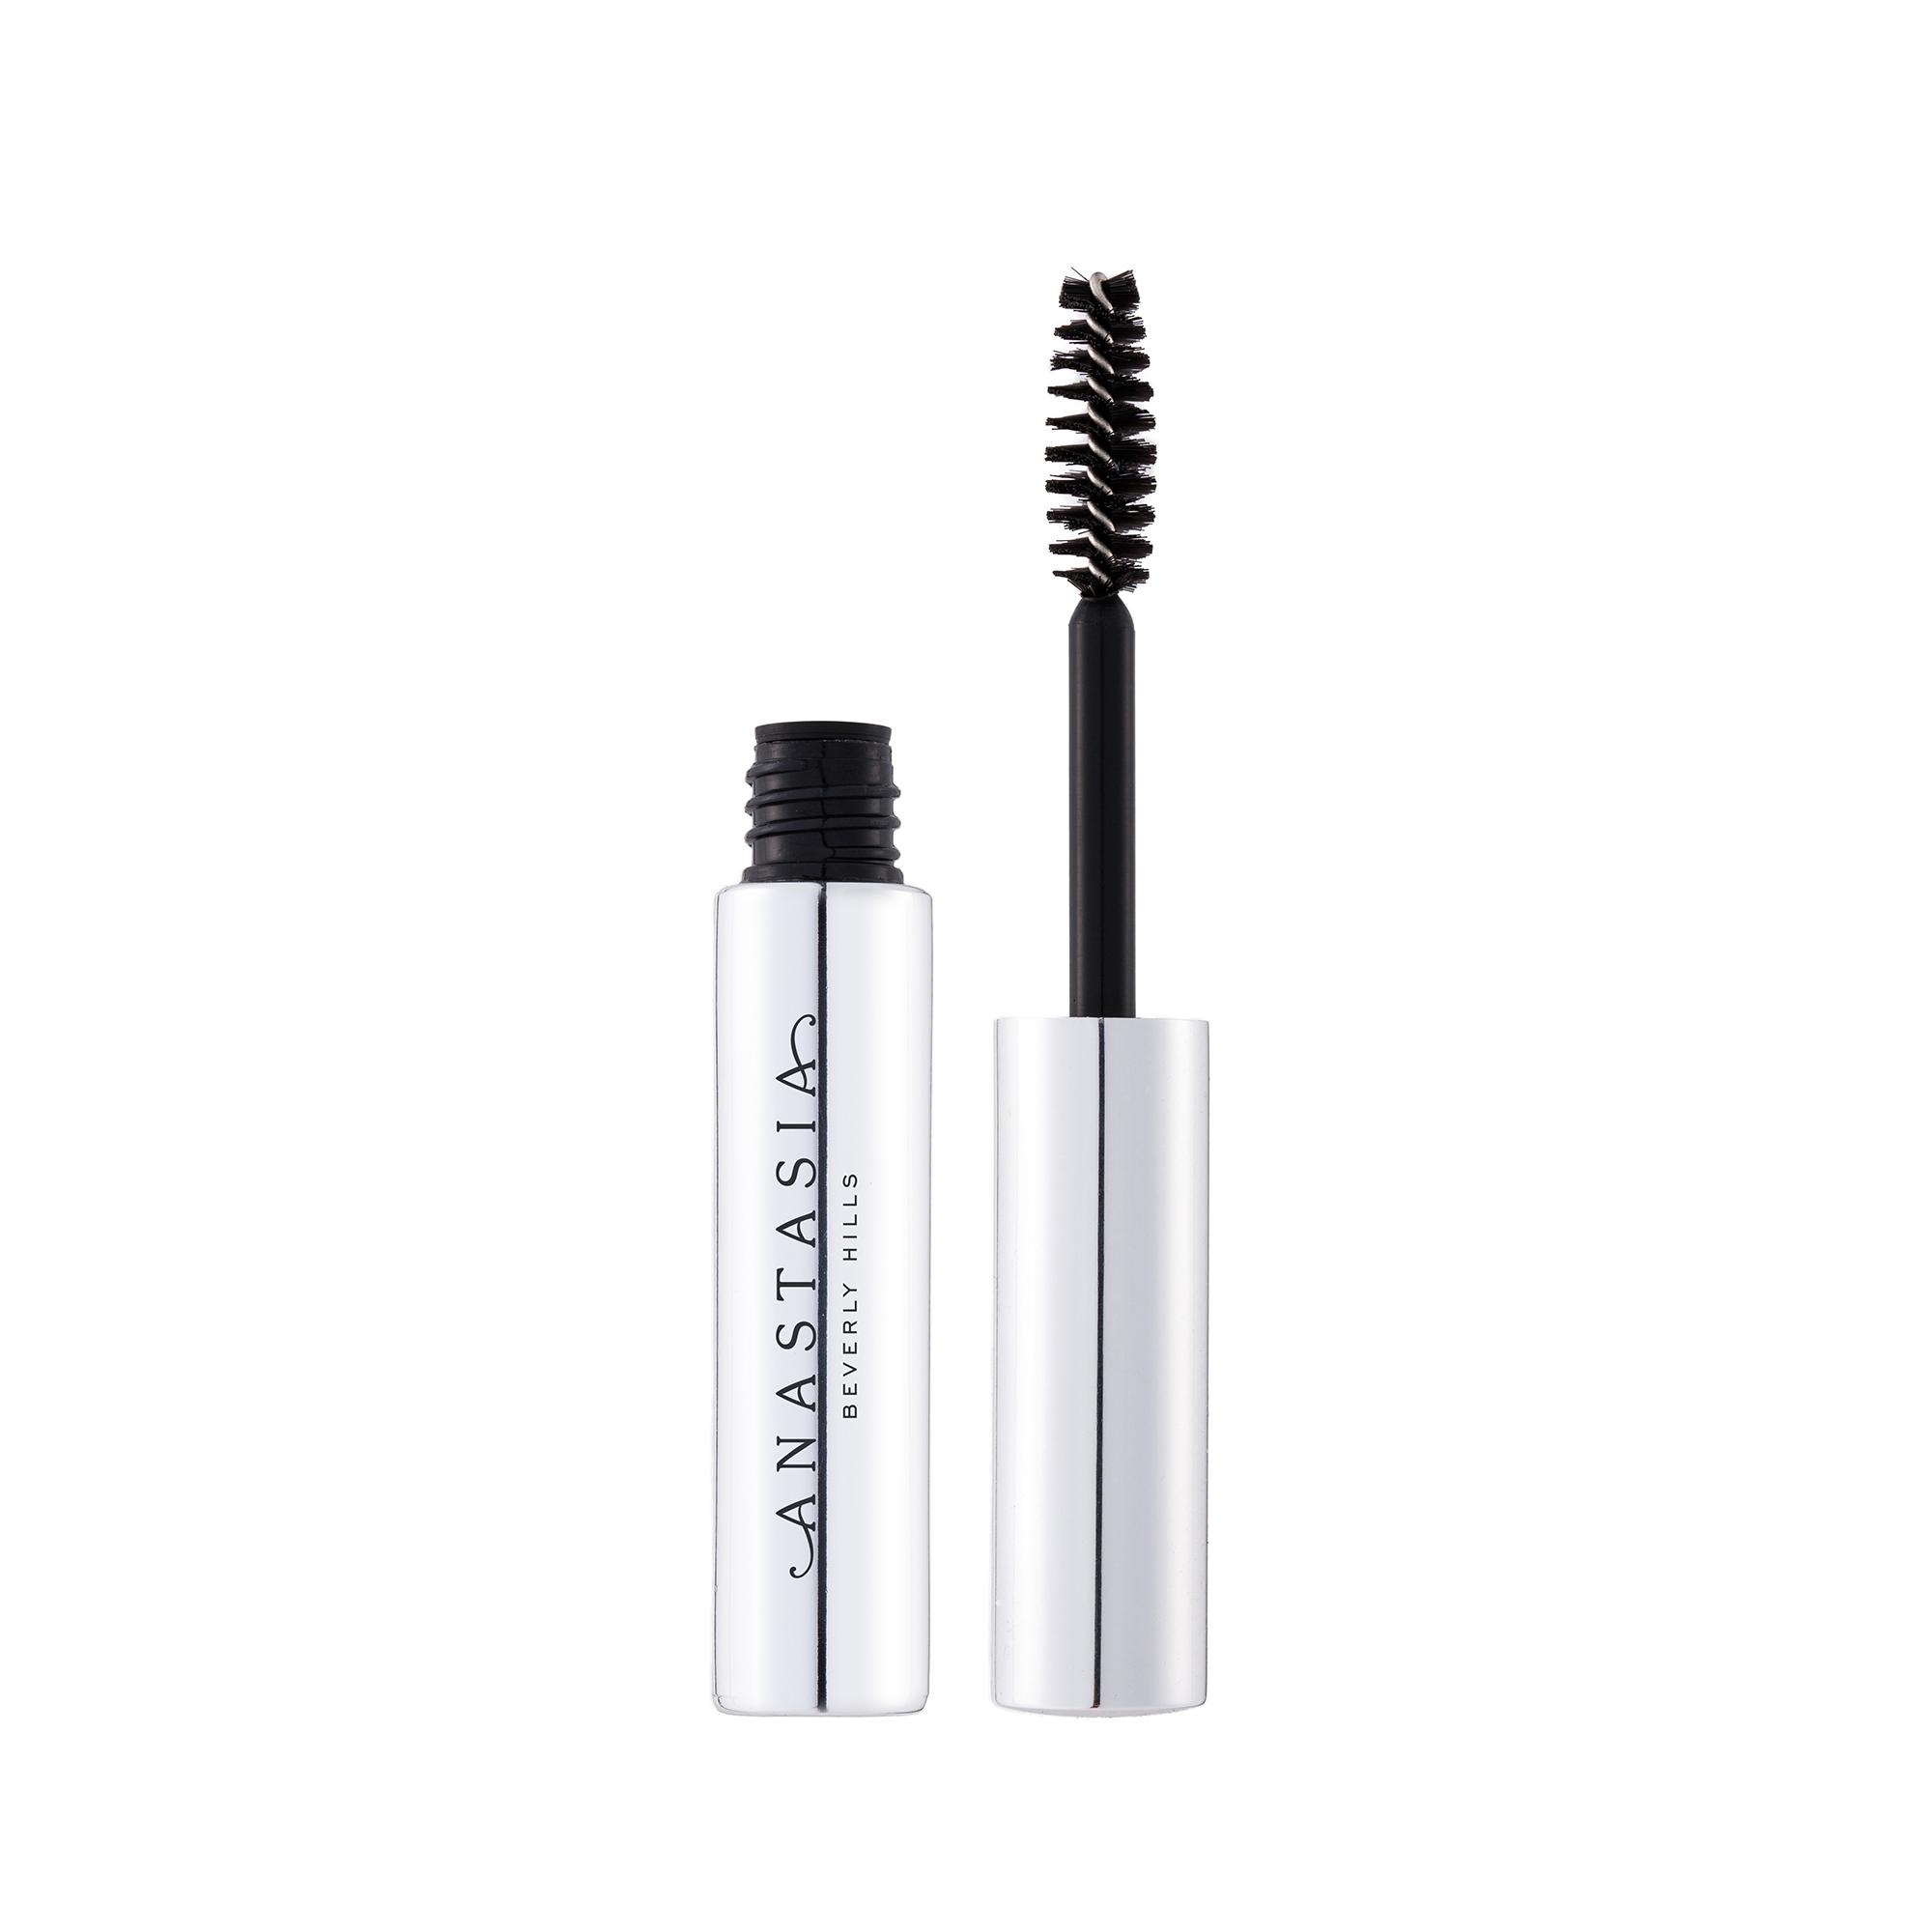 anastasia-clear-brow-gel-best eyebrow recommendations.jpg